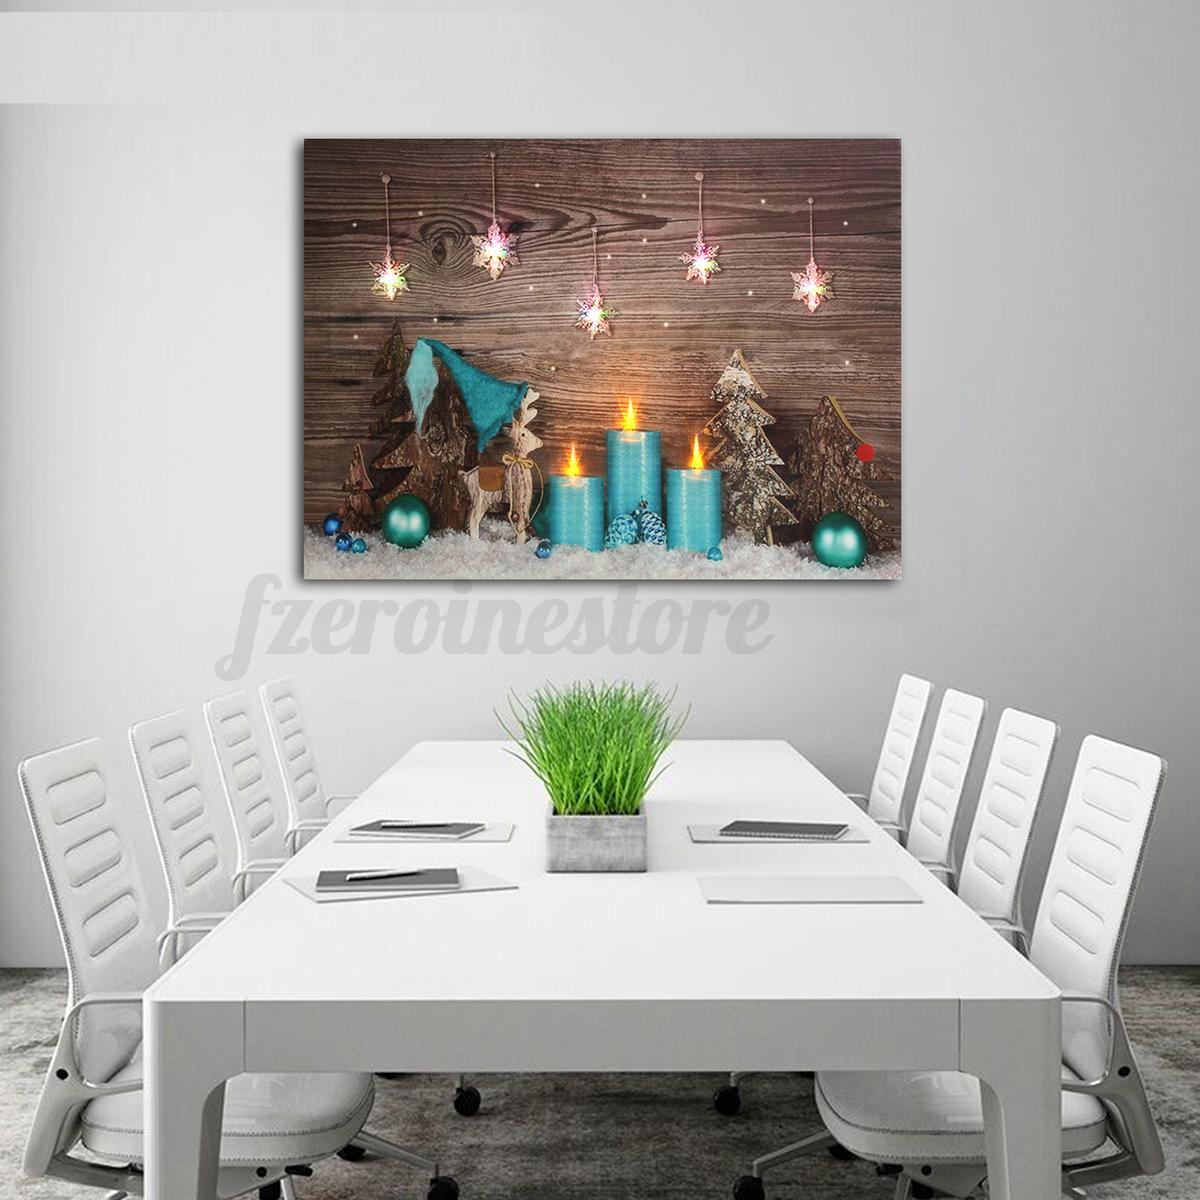 led bild mit beleuchtung leuchtbild kerzen leinwandbild. Black Bedroom Furniture Sets. Home Design Ideas